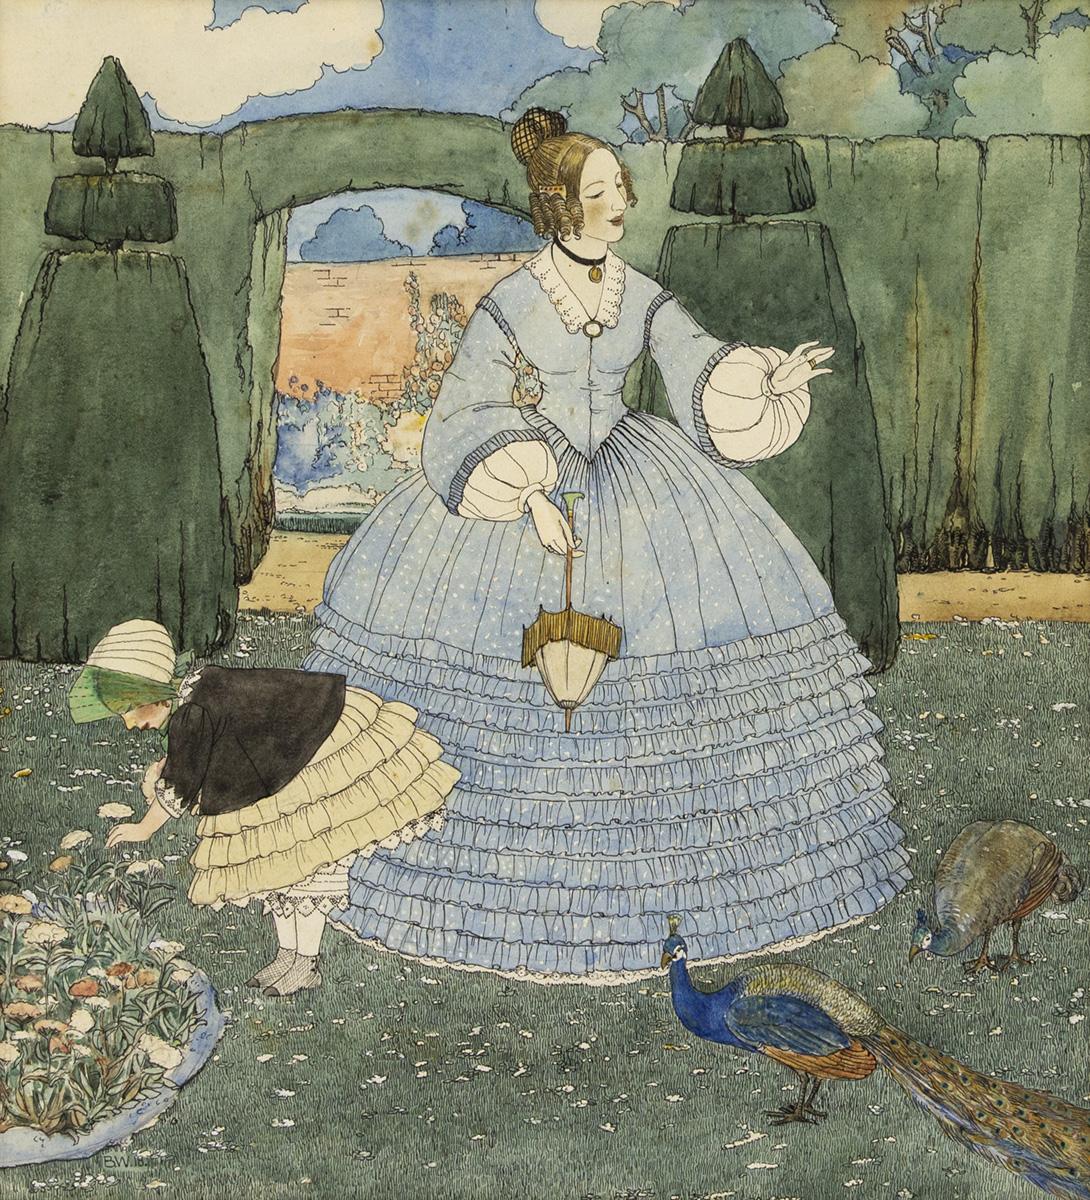 [FAIRY TALE] B.W. Garden scene with peacock. [CHILDRENS]